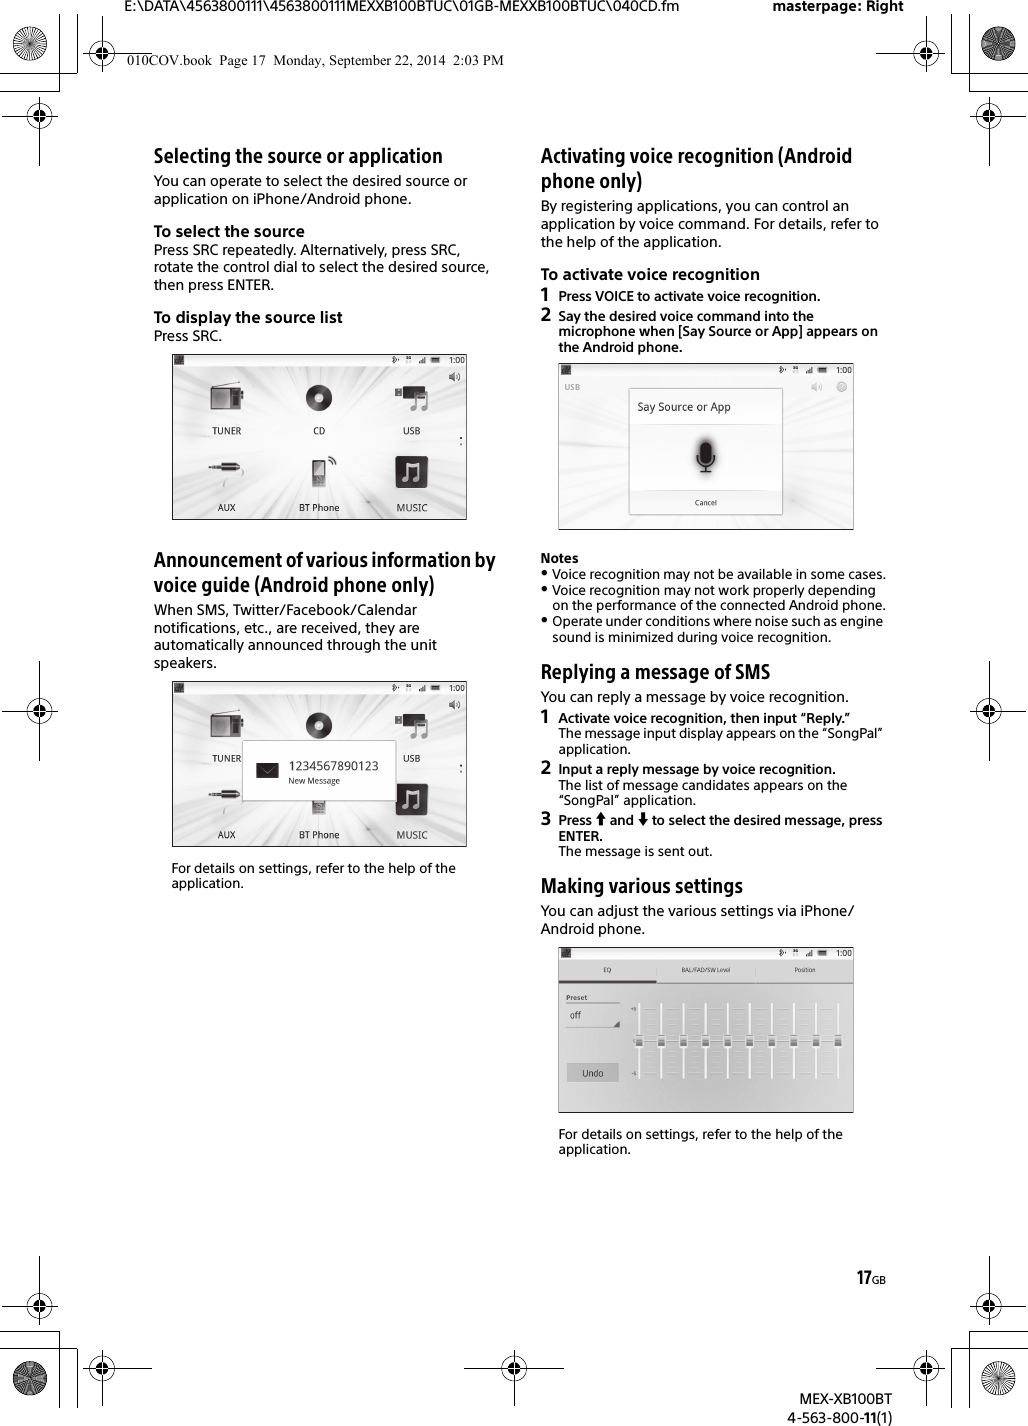 sony mex xb100bt user manual